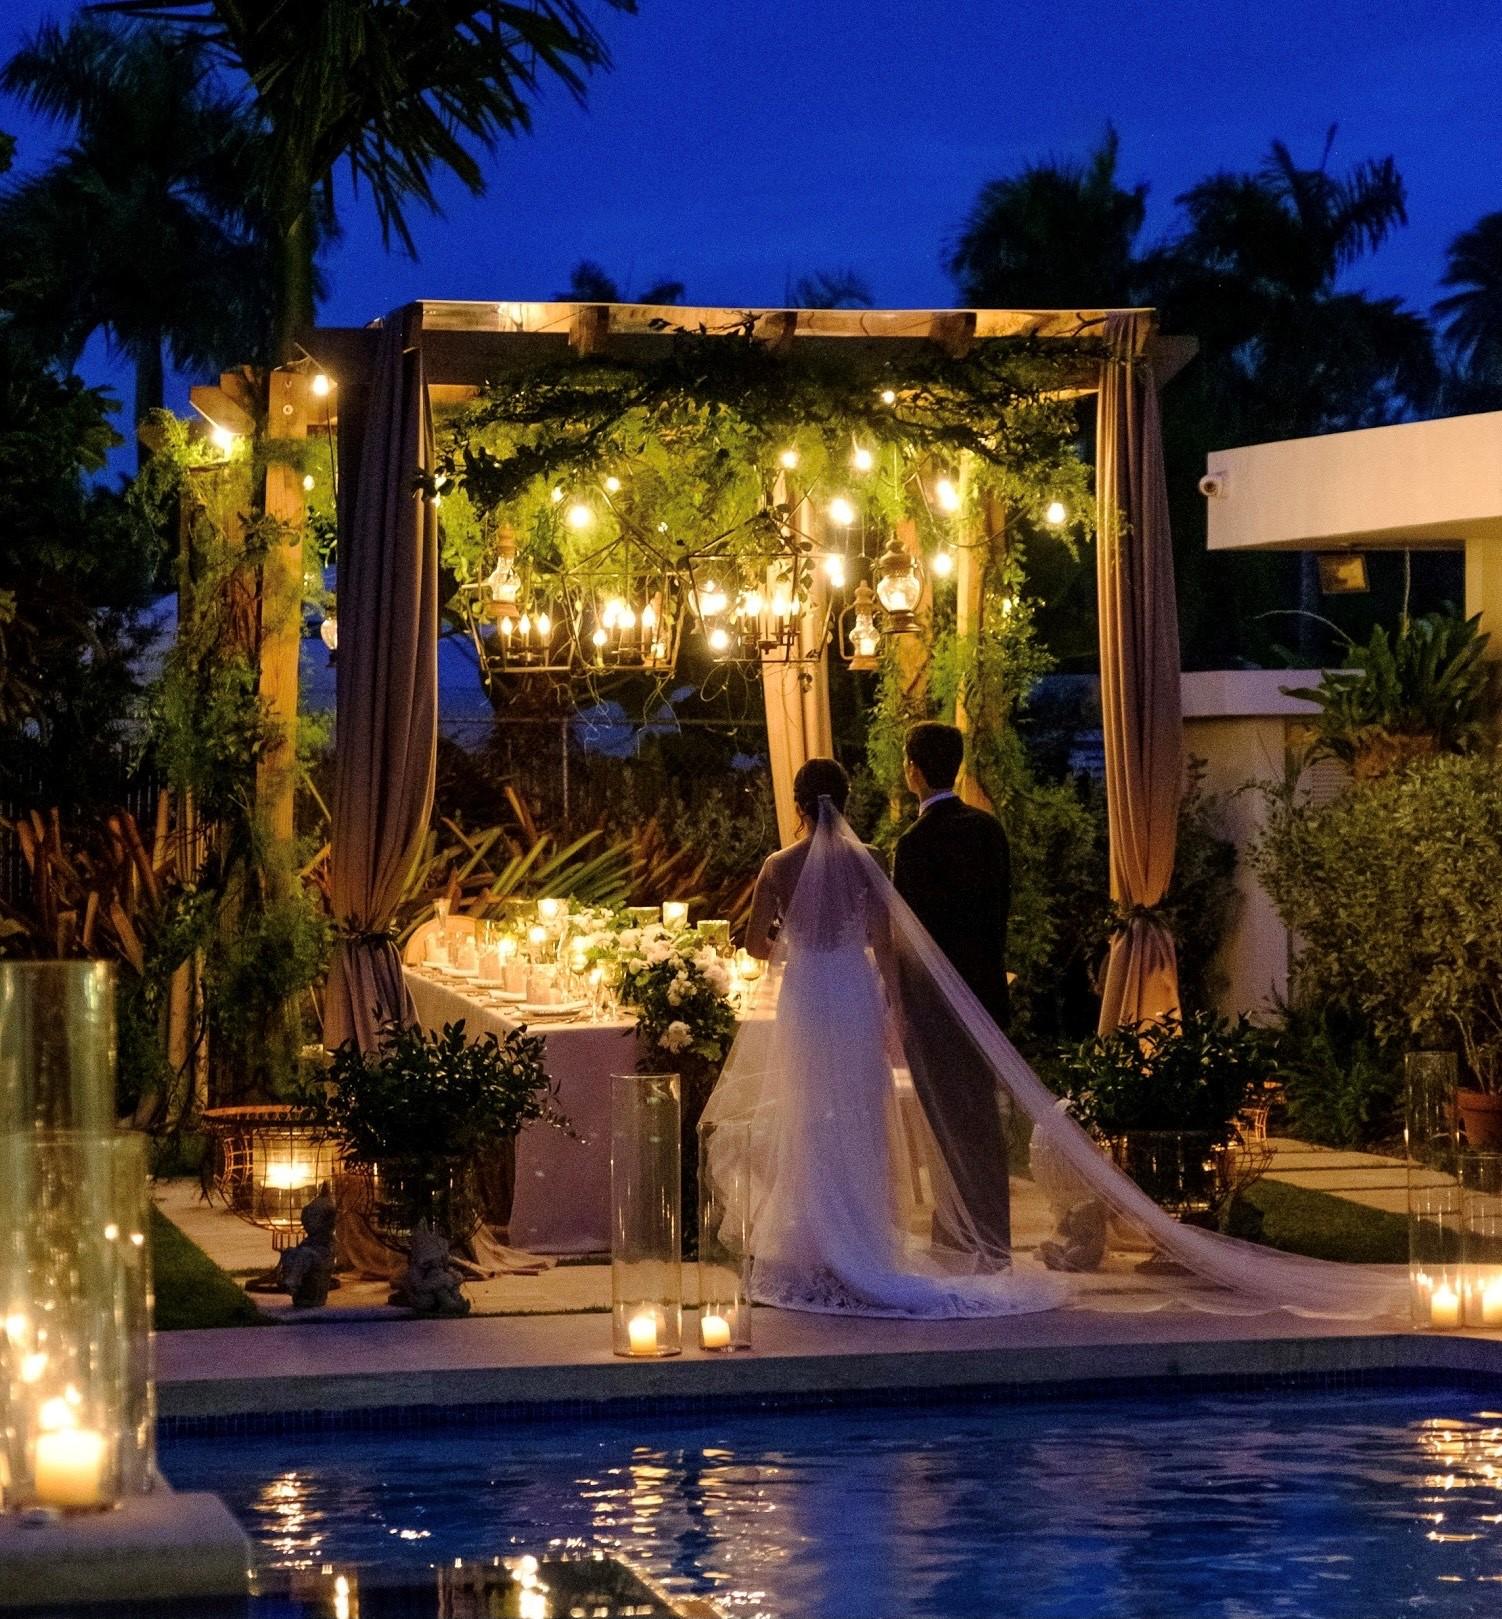 Vestido de la novia: Harry Robles. Arreglo personal: Raúl Collazo. Atuendo del novio: Leonardo's Fifth Avenue (Wedding Mafia)